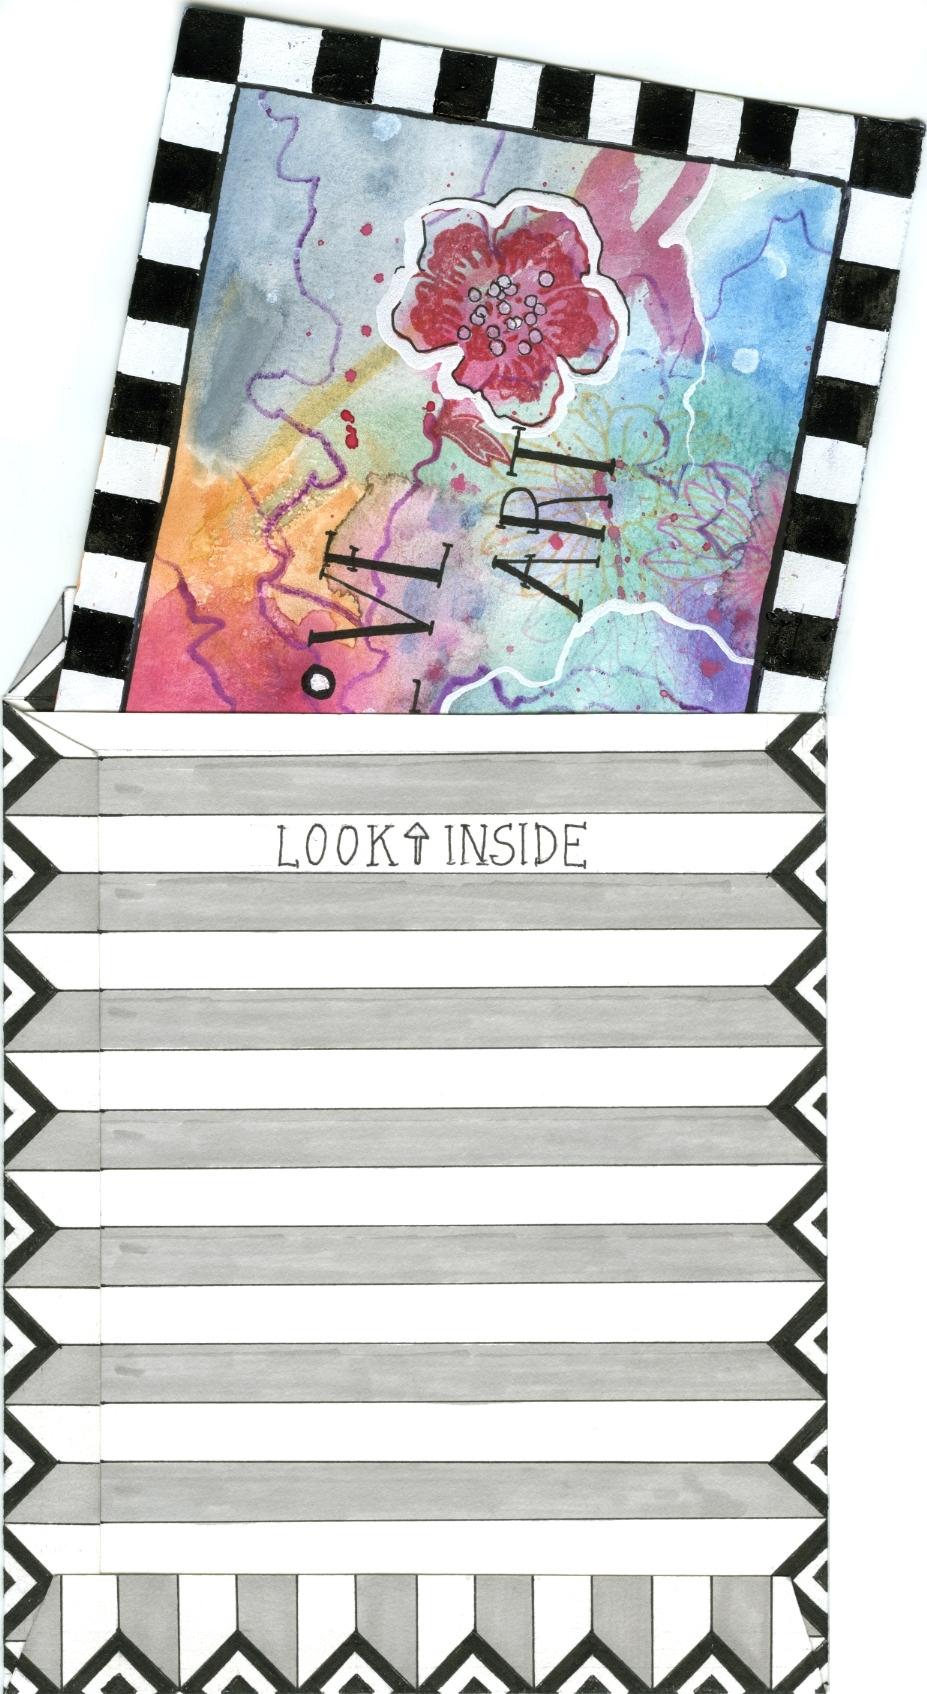 20130621 - Art-Mooc-opdracht Correspondence with memory door Janet Plantinga, 3